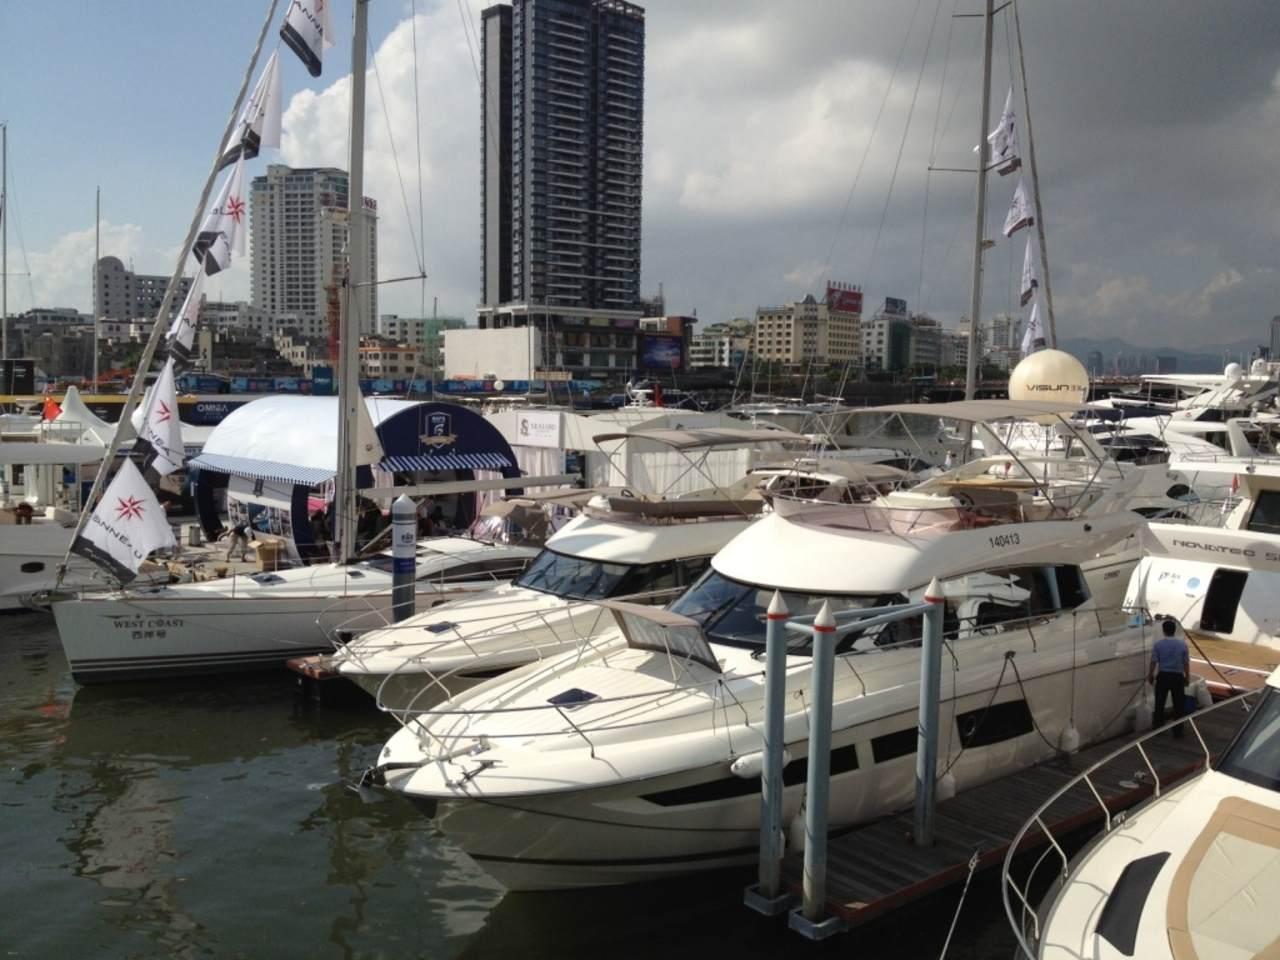 Jeanneau and Prestige in Hainan Rendez-vous boatshow 6